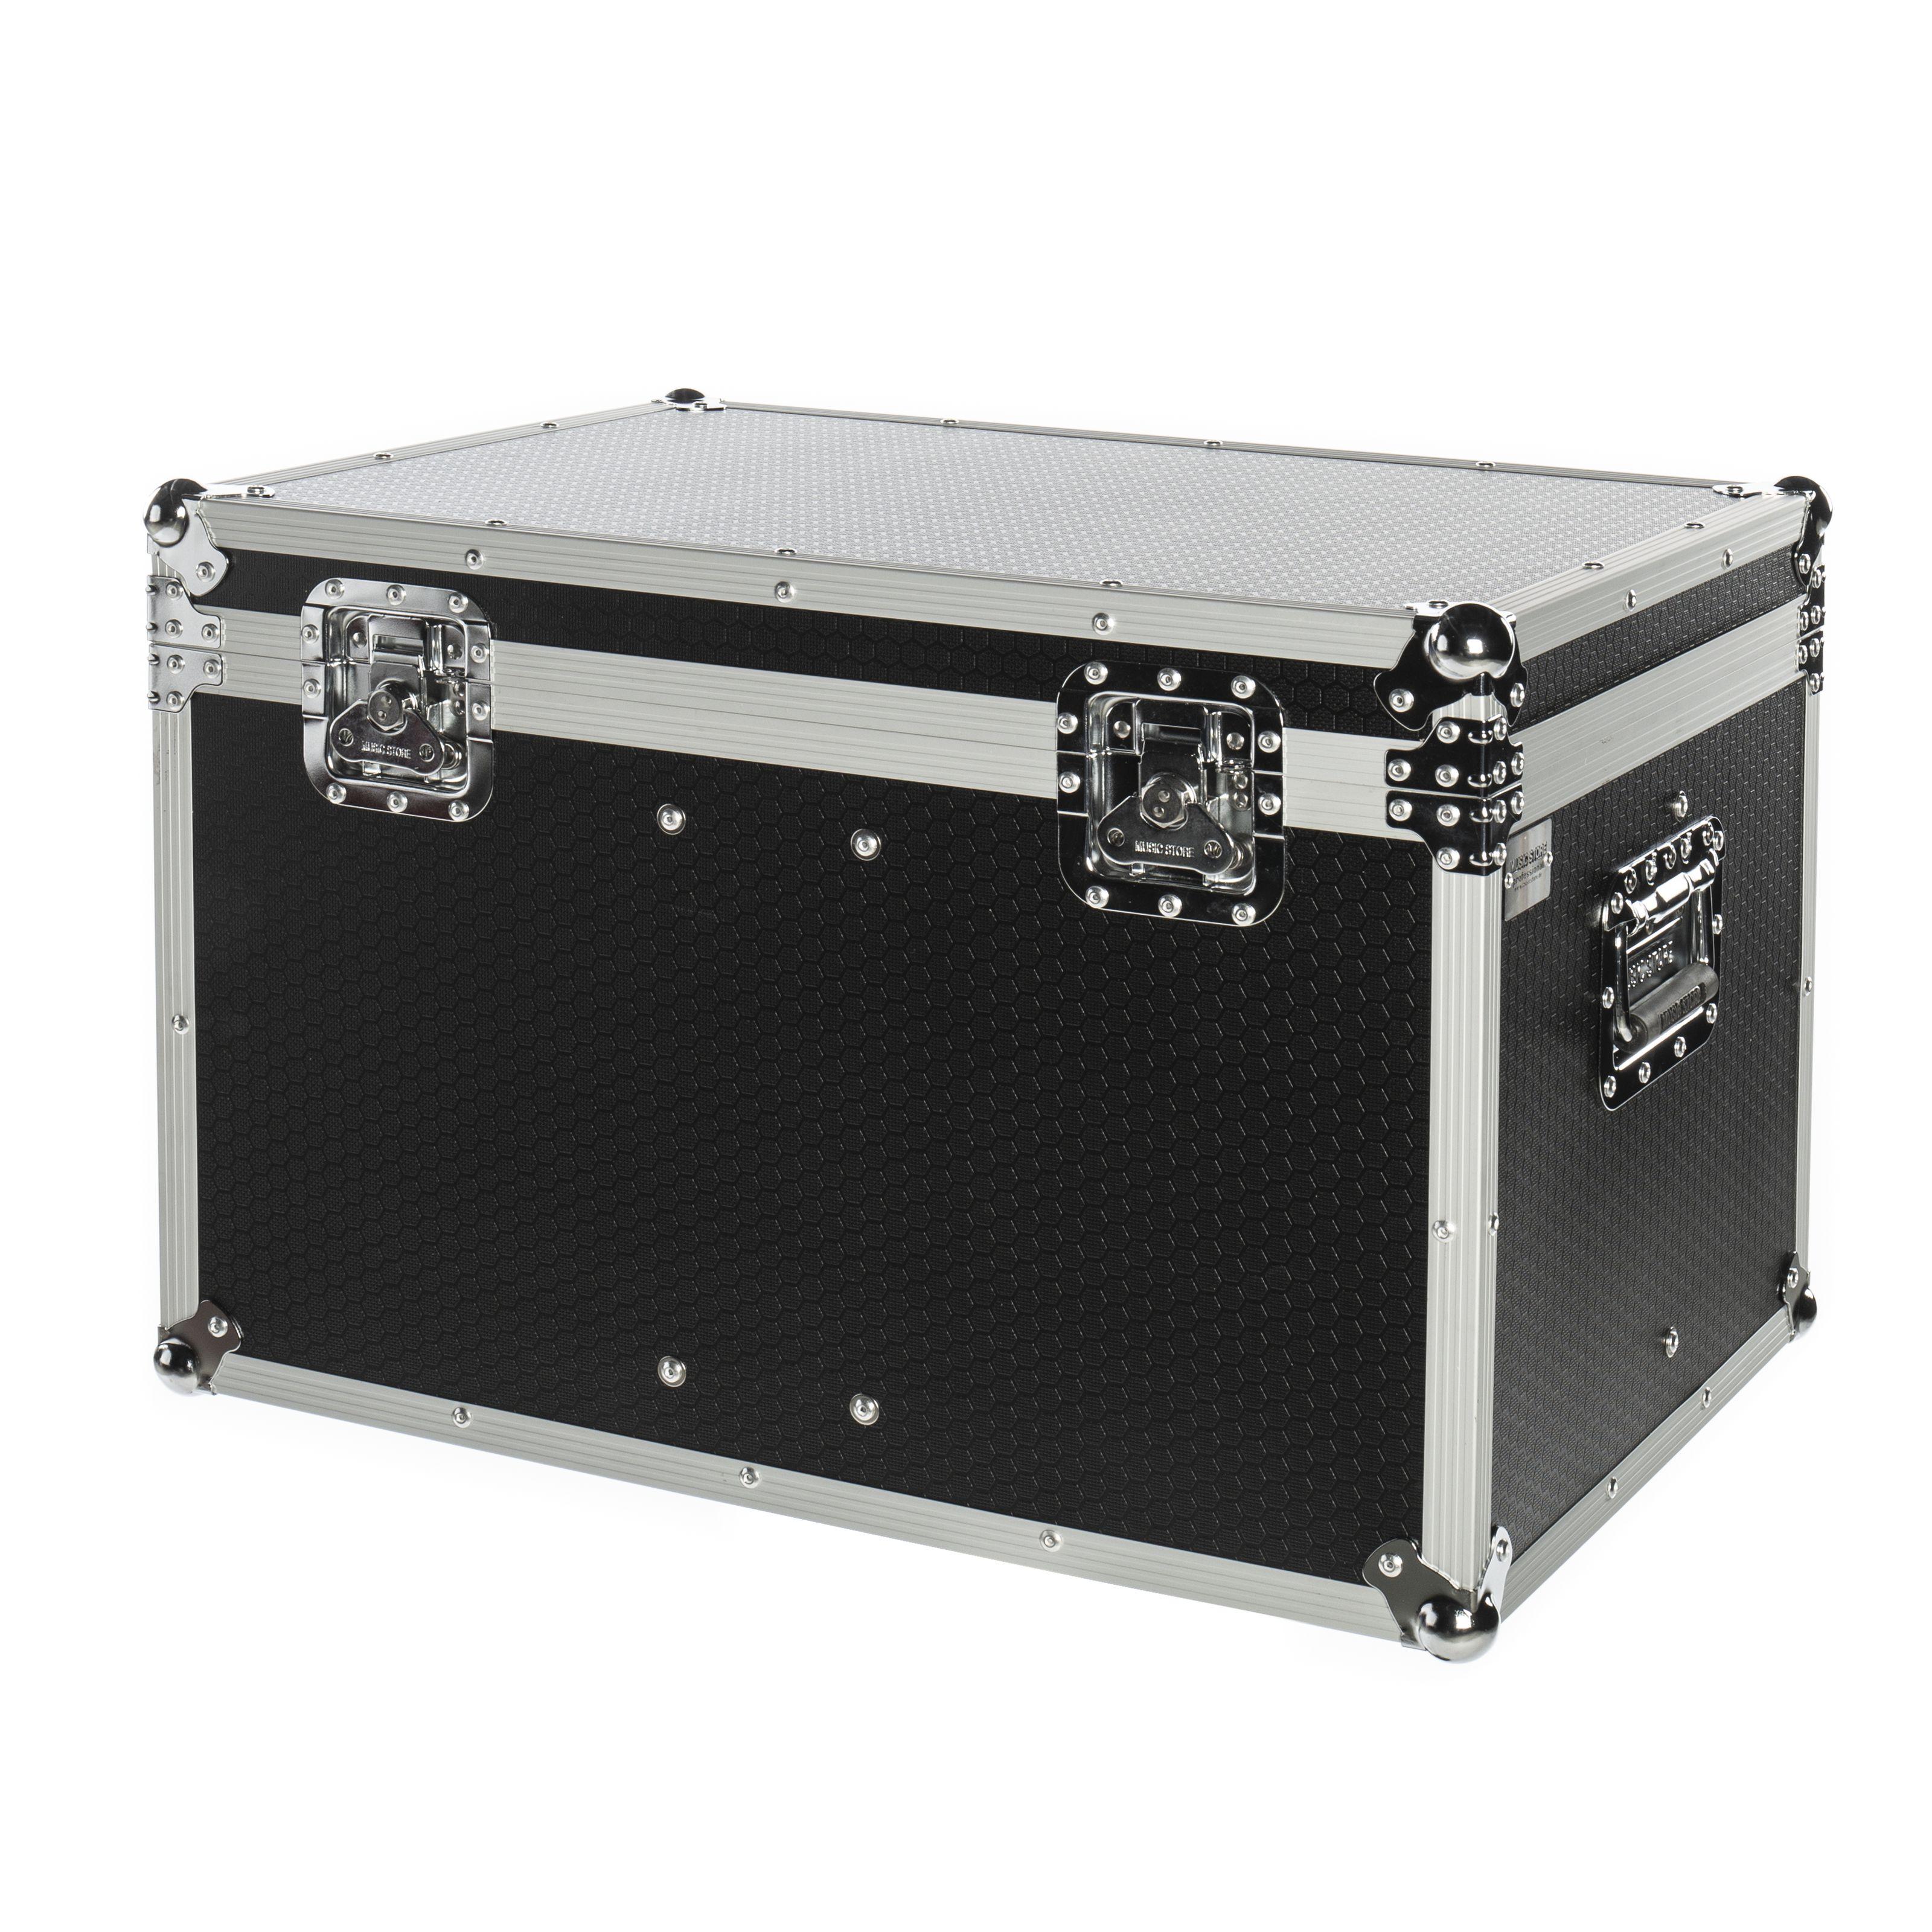 MUSIC STORE - TOUR CASE 4x Phantom Spot 65 Case 4x Phantom 65